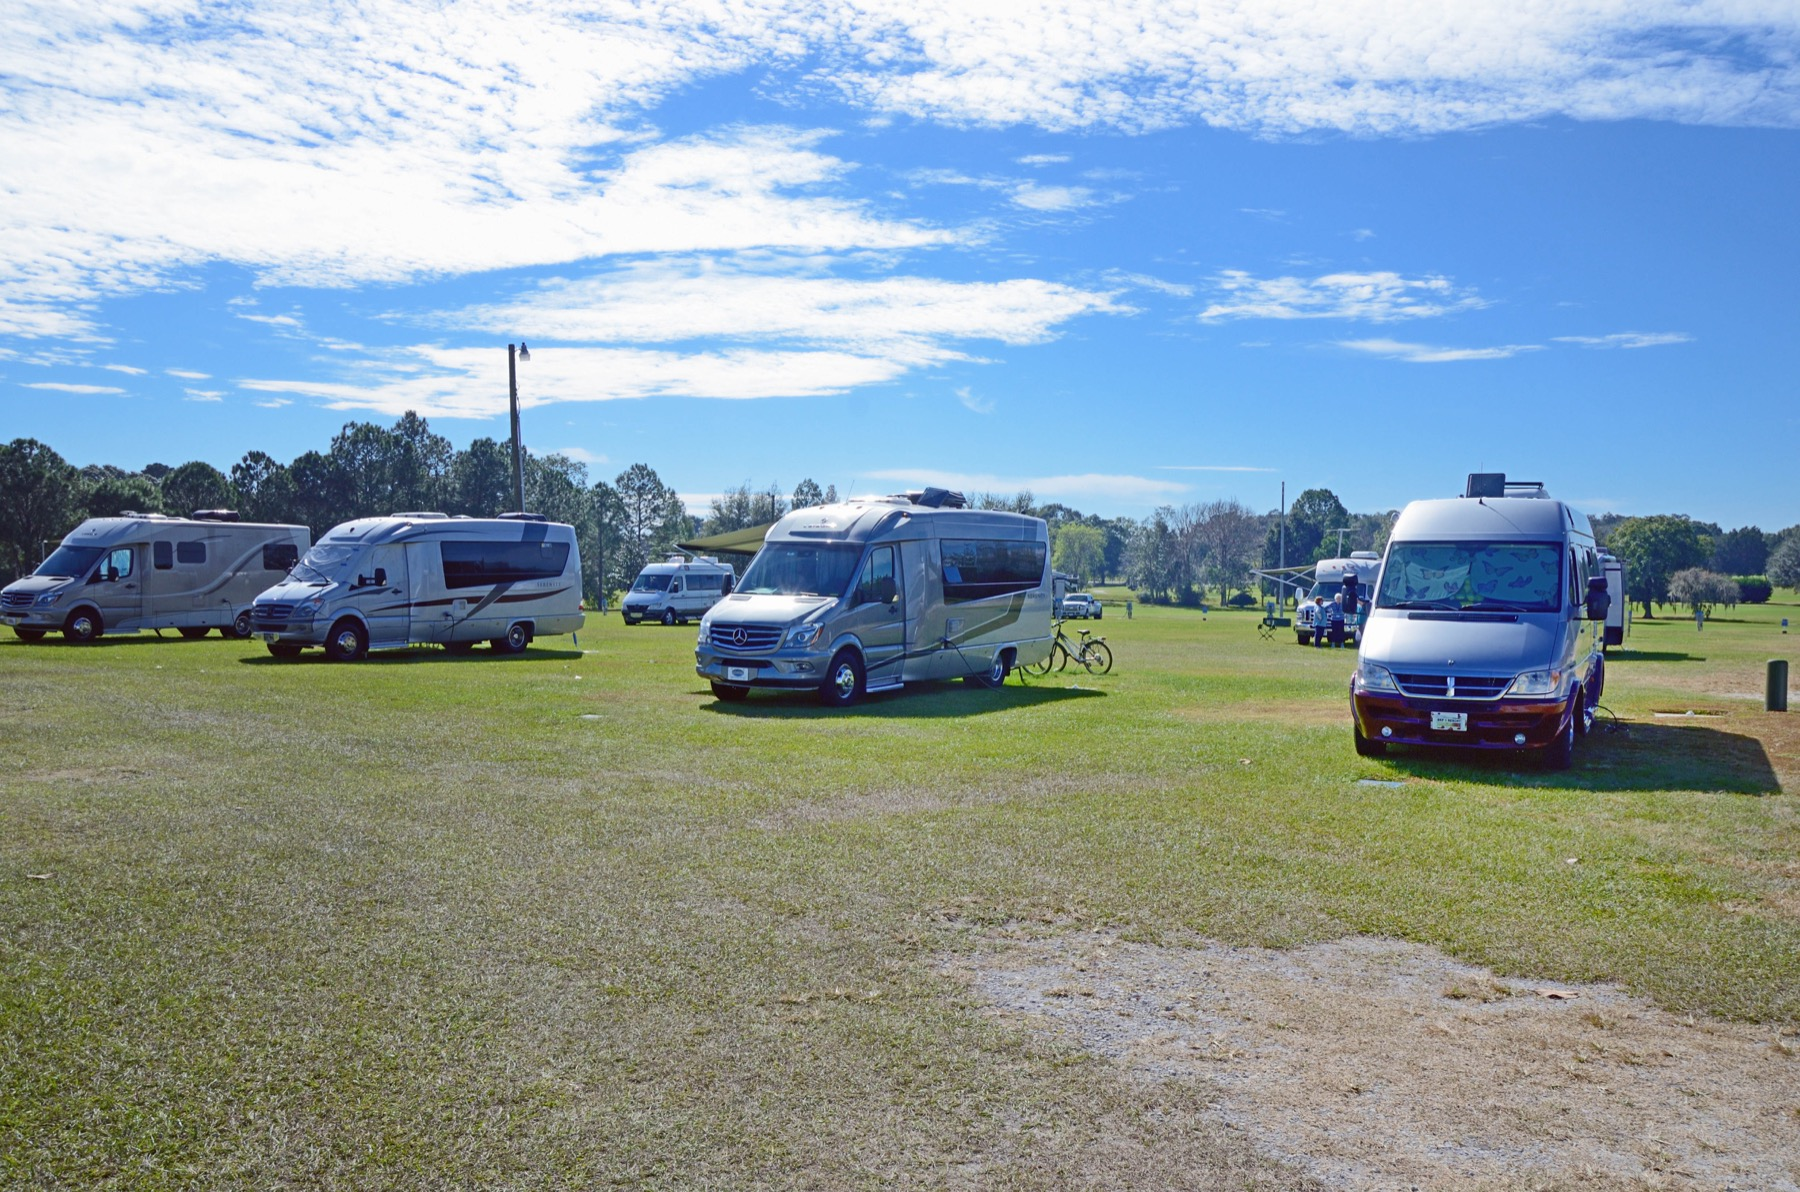 010-Some LTV Vans